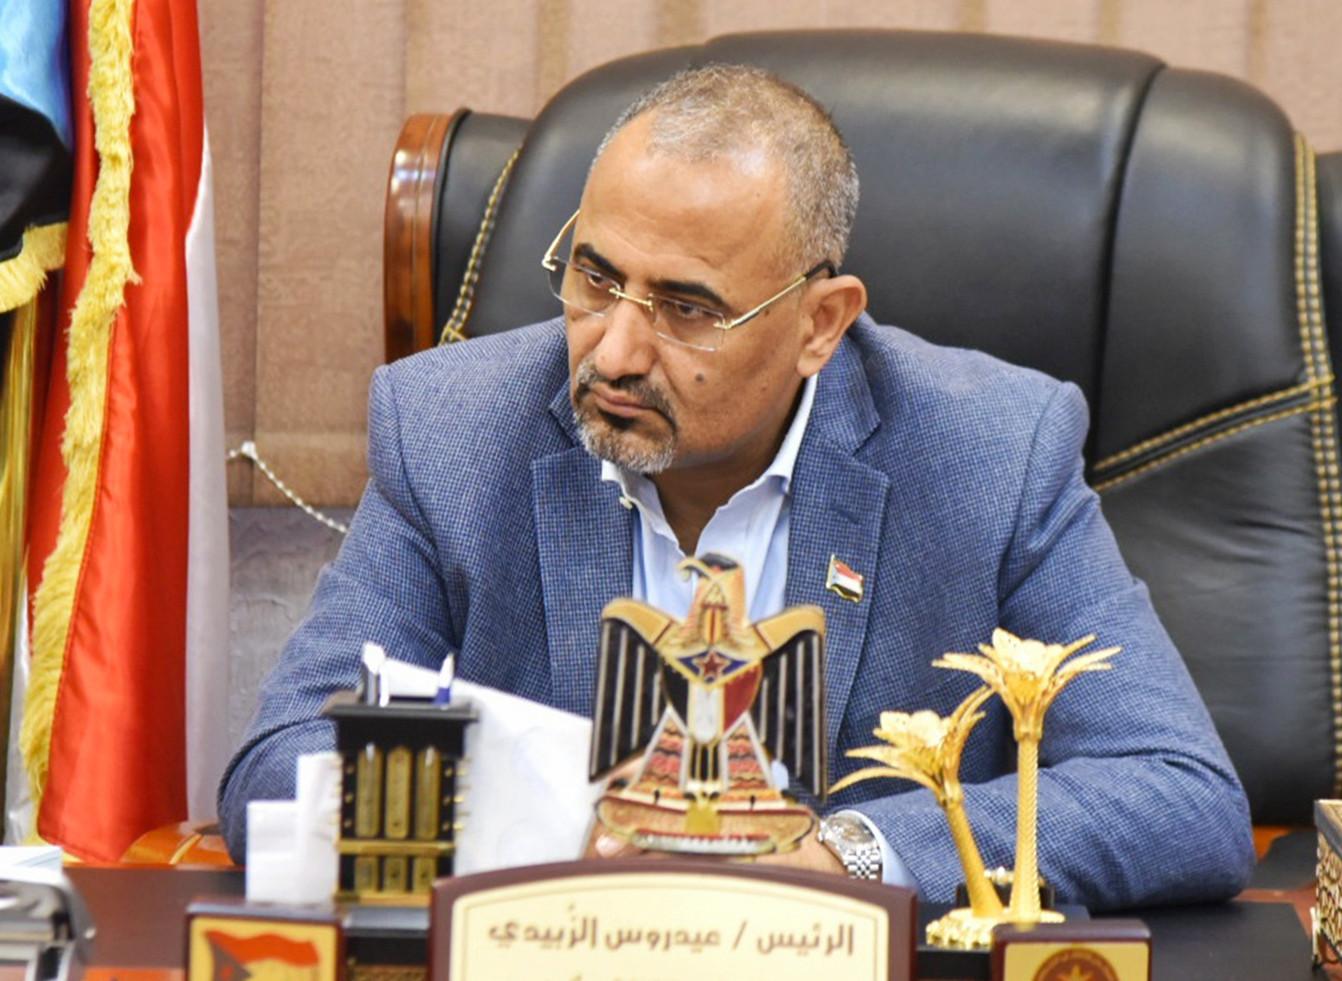 Yemen crisis deepens as separatists declare self-governance